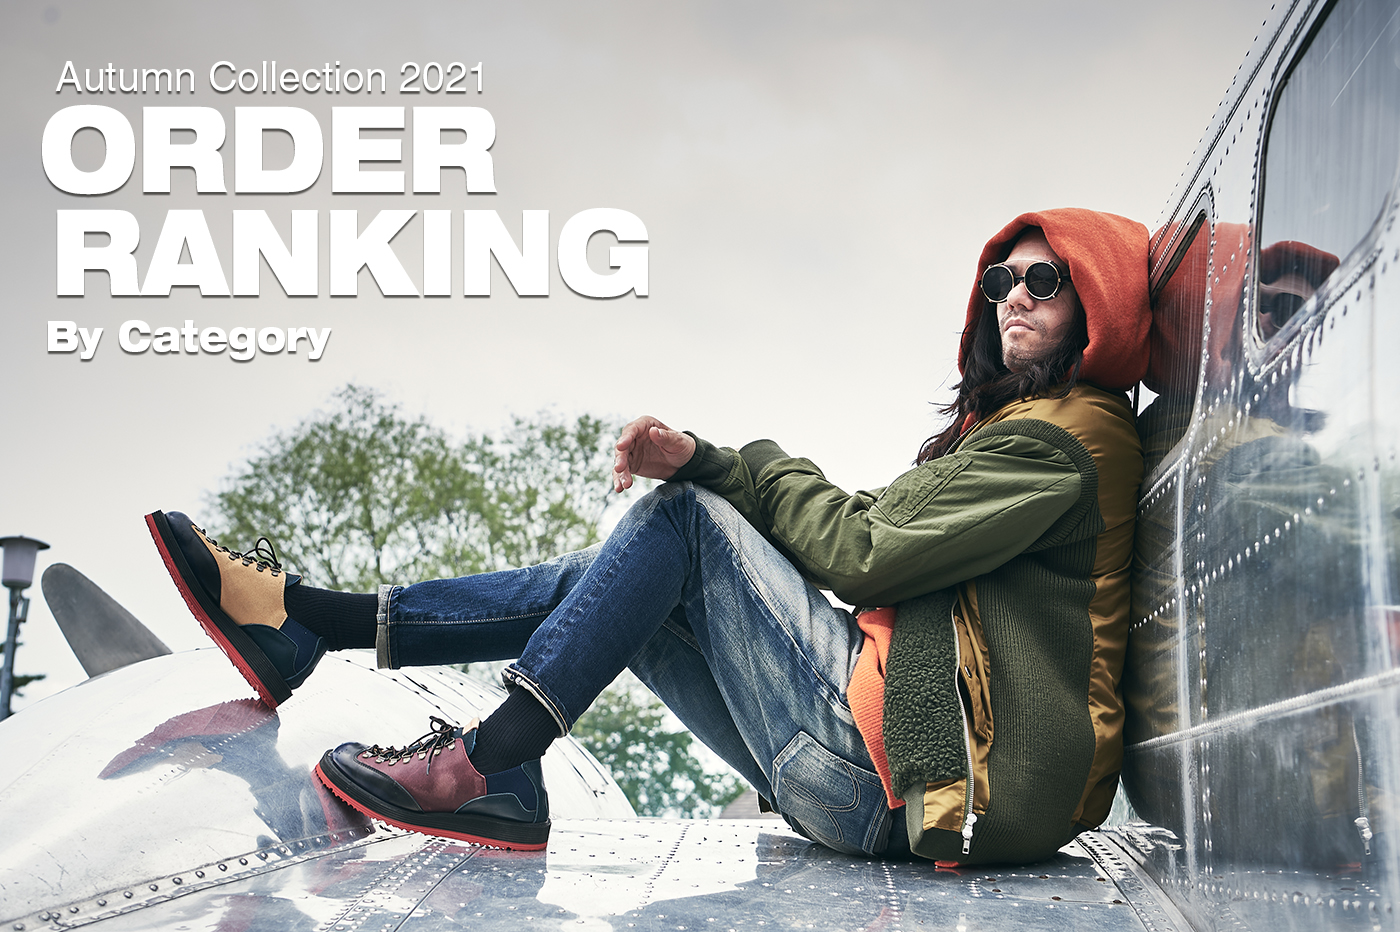 Autumn Collection 2021 ORDER RANKING